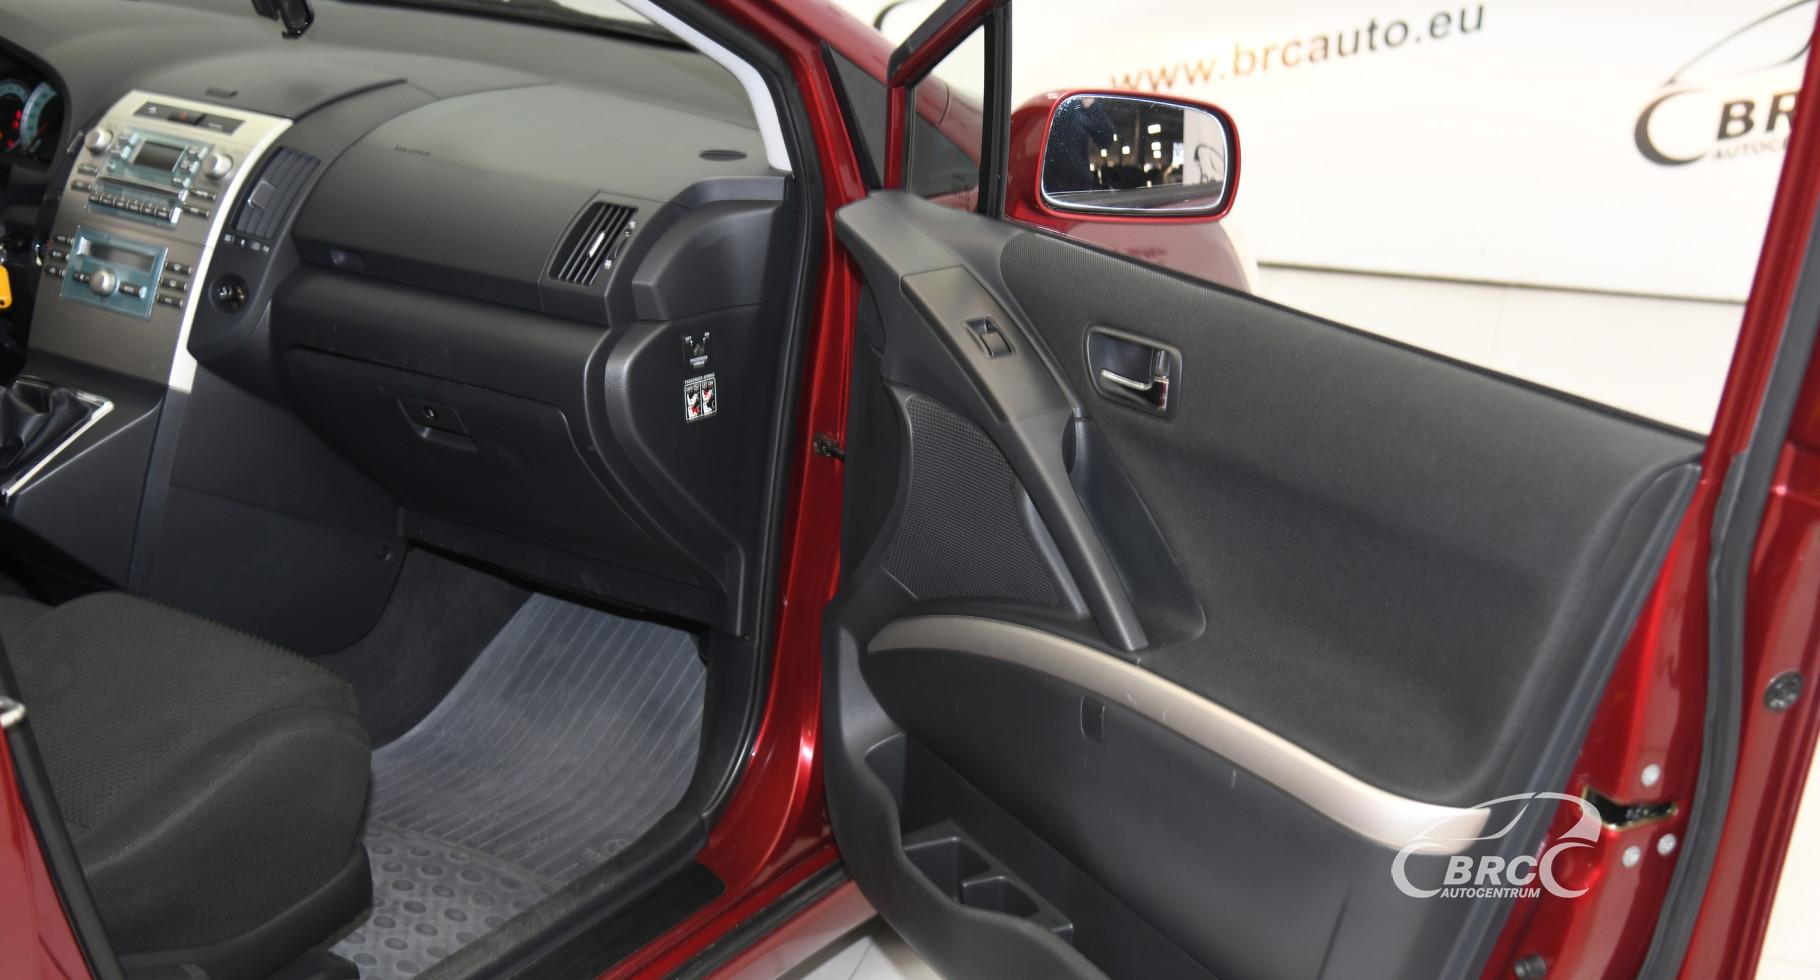 Toyota Corolla Verso 1.8 VVT LineaSol